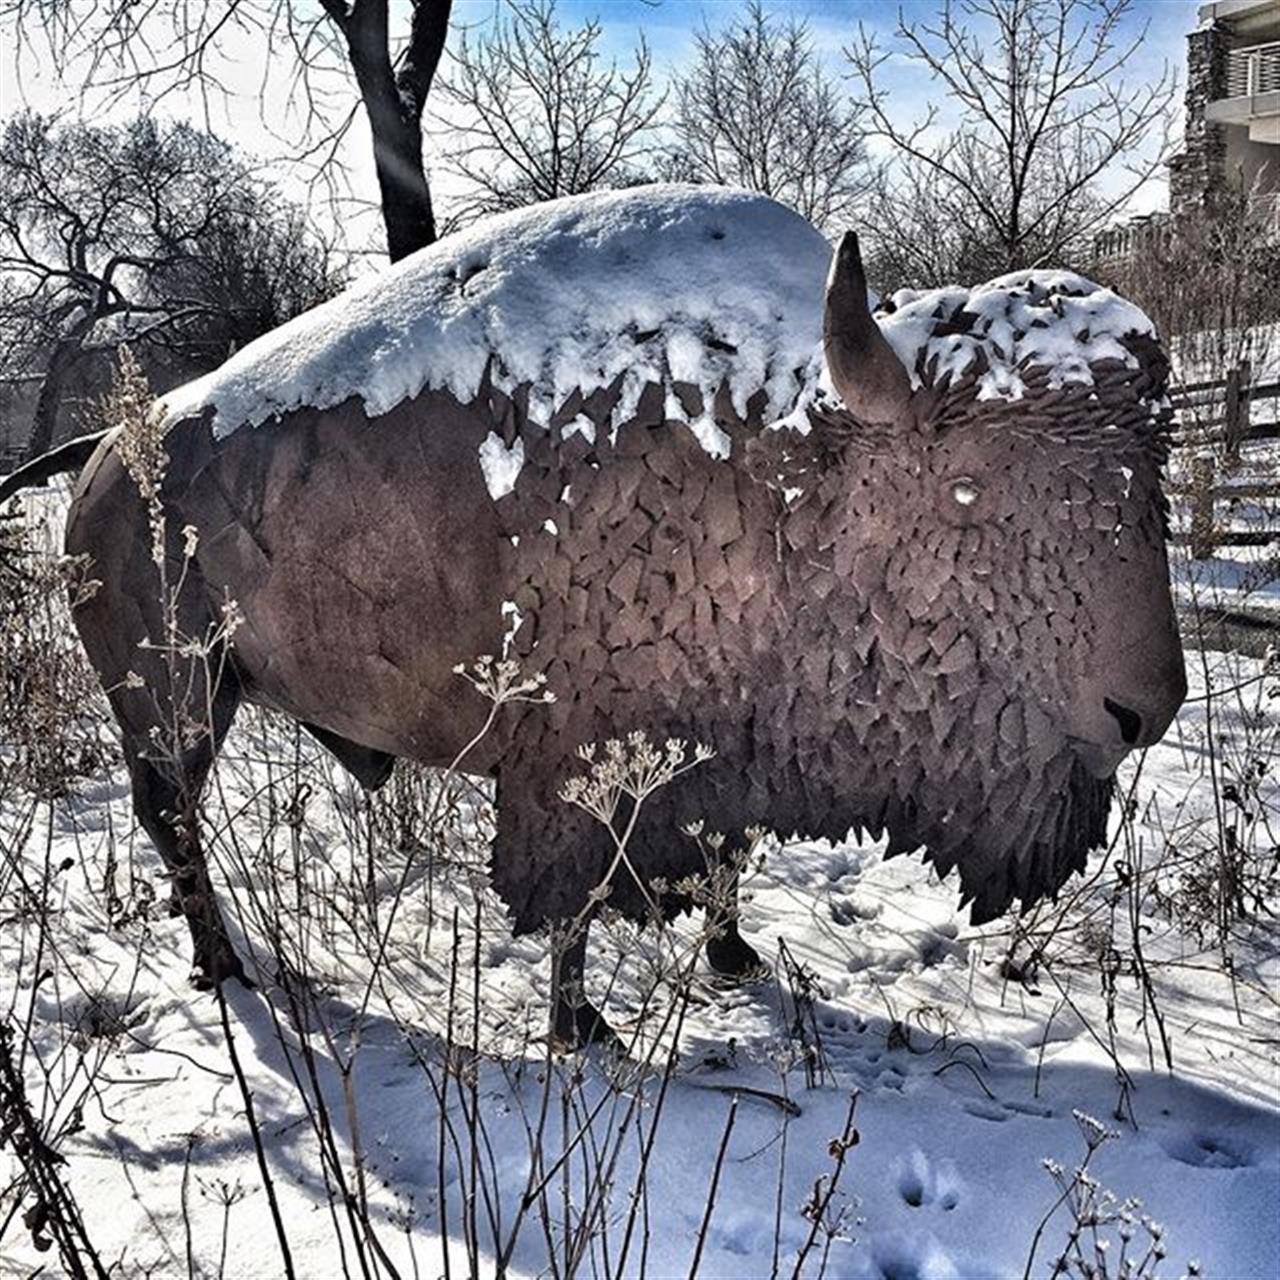 Peggy NotebaertÔÇÖs bison #LivingWellinChicago #realestate #leadingrelocal #chicago #howtosellyourhome #bestjobintheworld #diverseyharbor  #peggynotebaertnaturemuseum  #bairdwarner #findmychicagohome #lincolnpark #cityliving #winterscenes